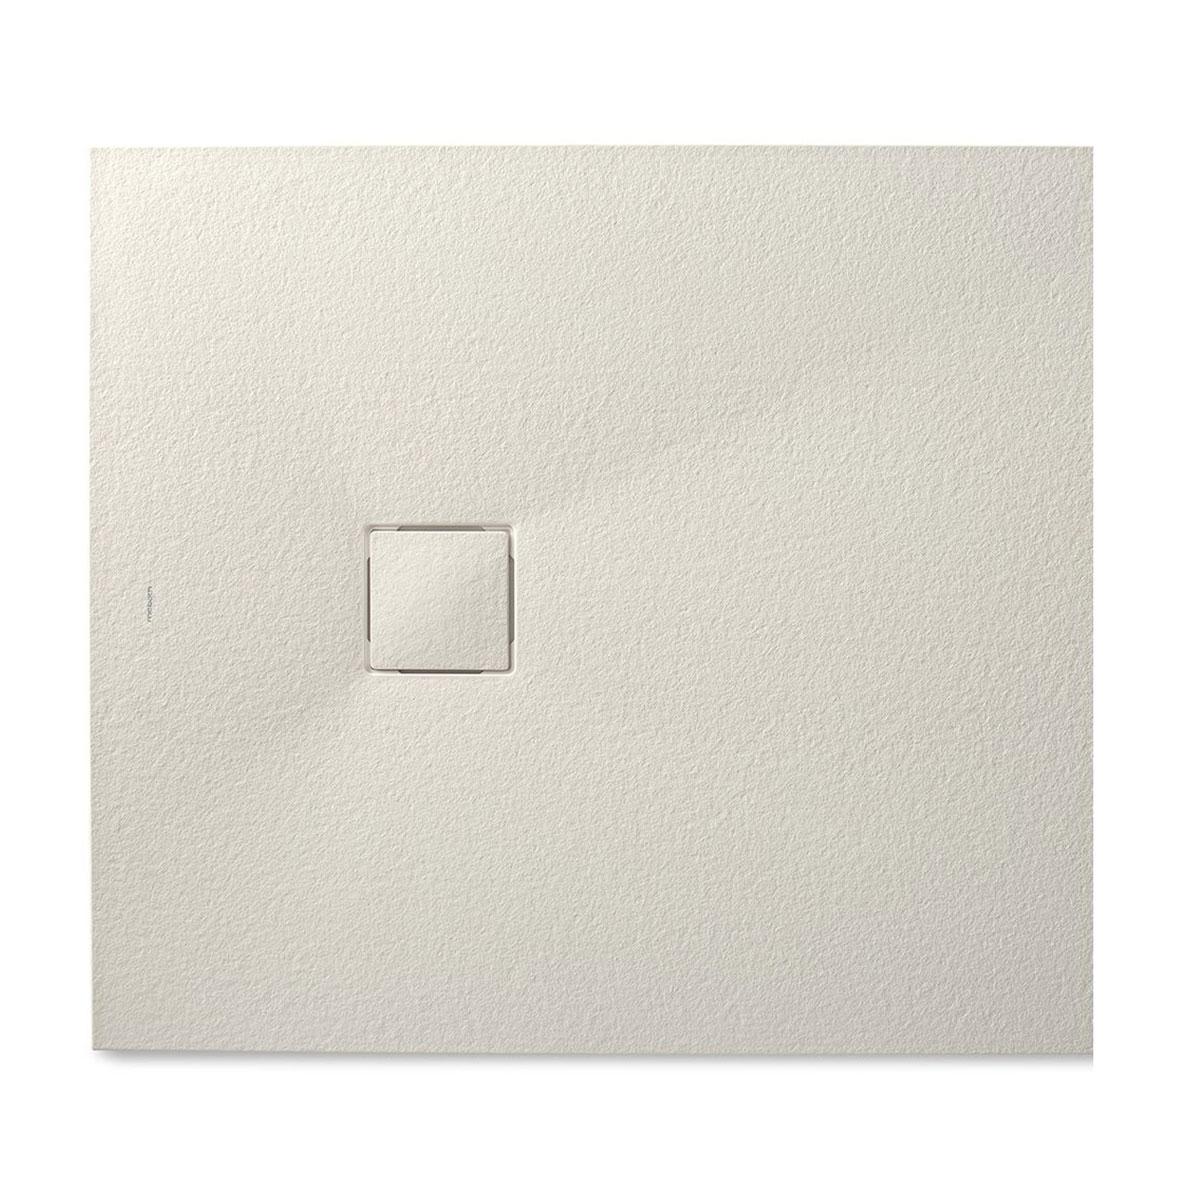 Plato de ducha rectangular 100x80 Zeus Vulcano Beige